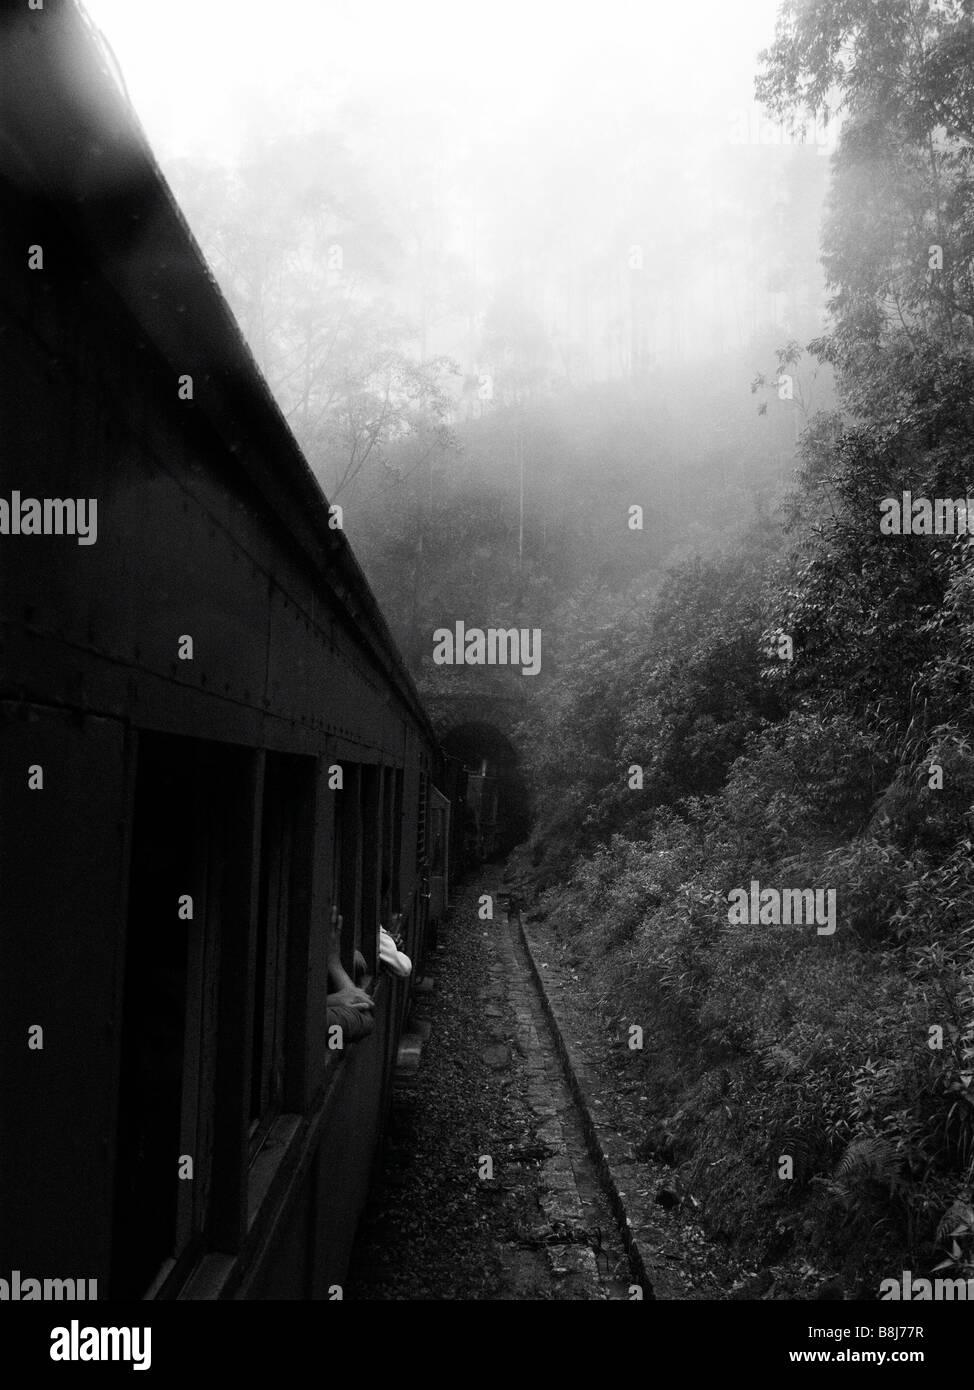 Train entering tunnel as it journeys through sri lank. Stock Photo